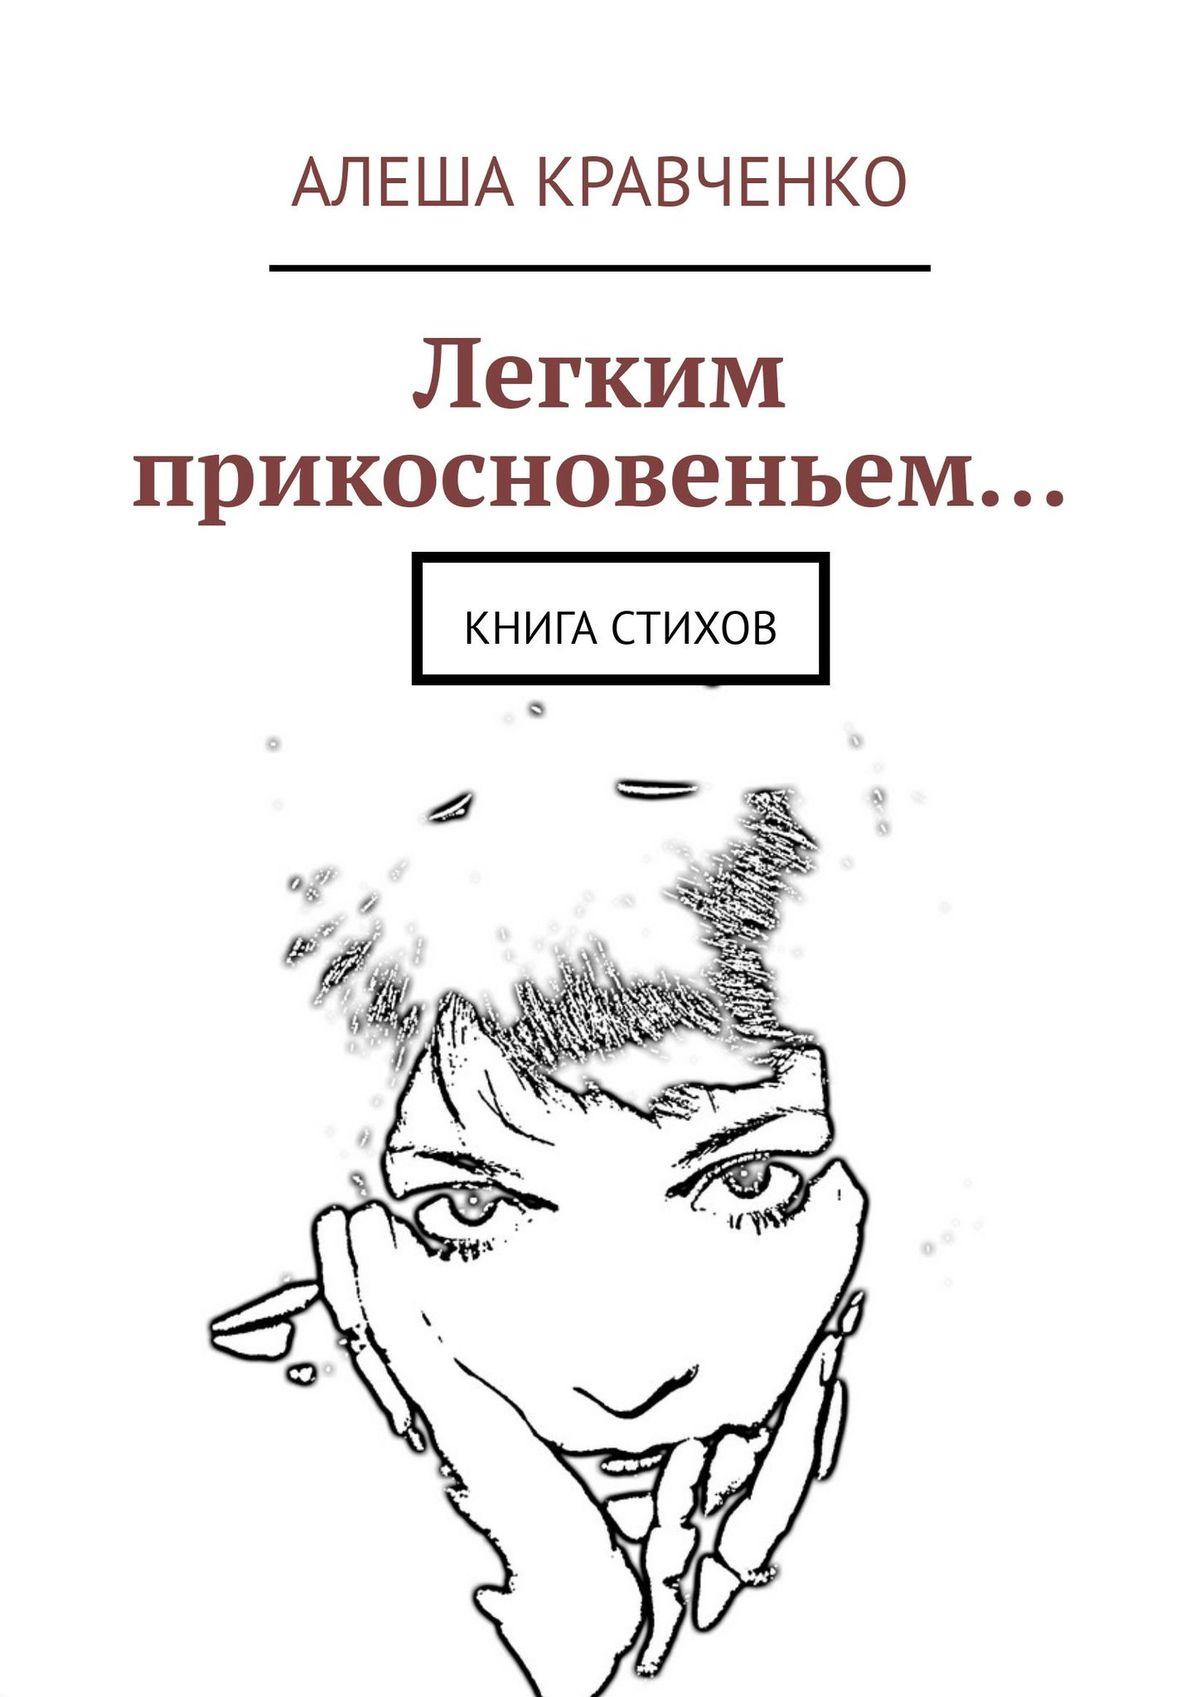 Алеша Кравченко Легким прикосновеньем… Книга стихов алеша кравченко терпкая лирика сборник стихотворений